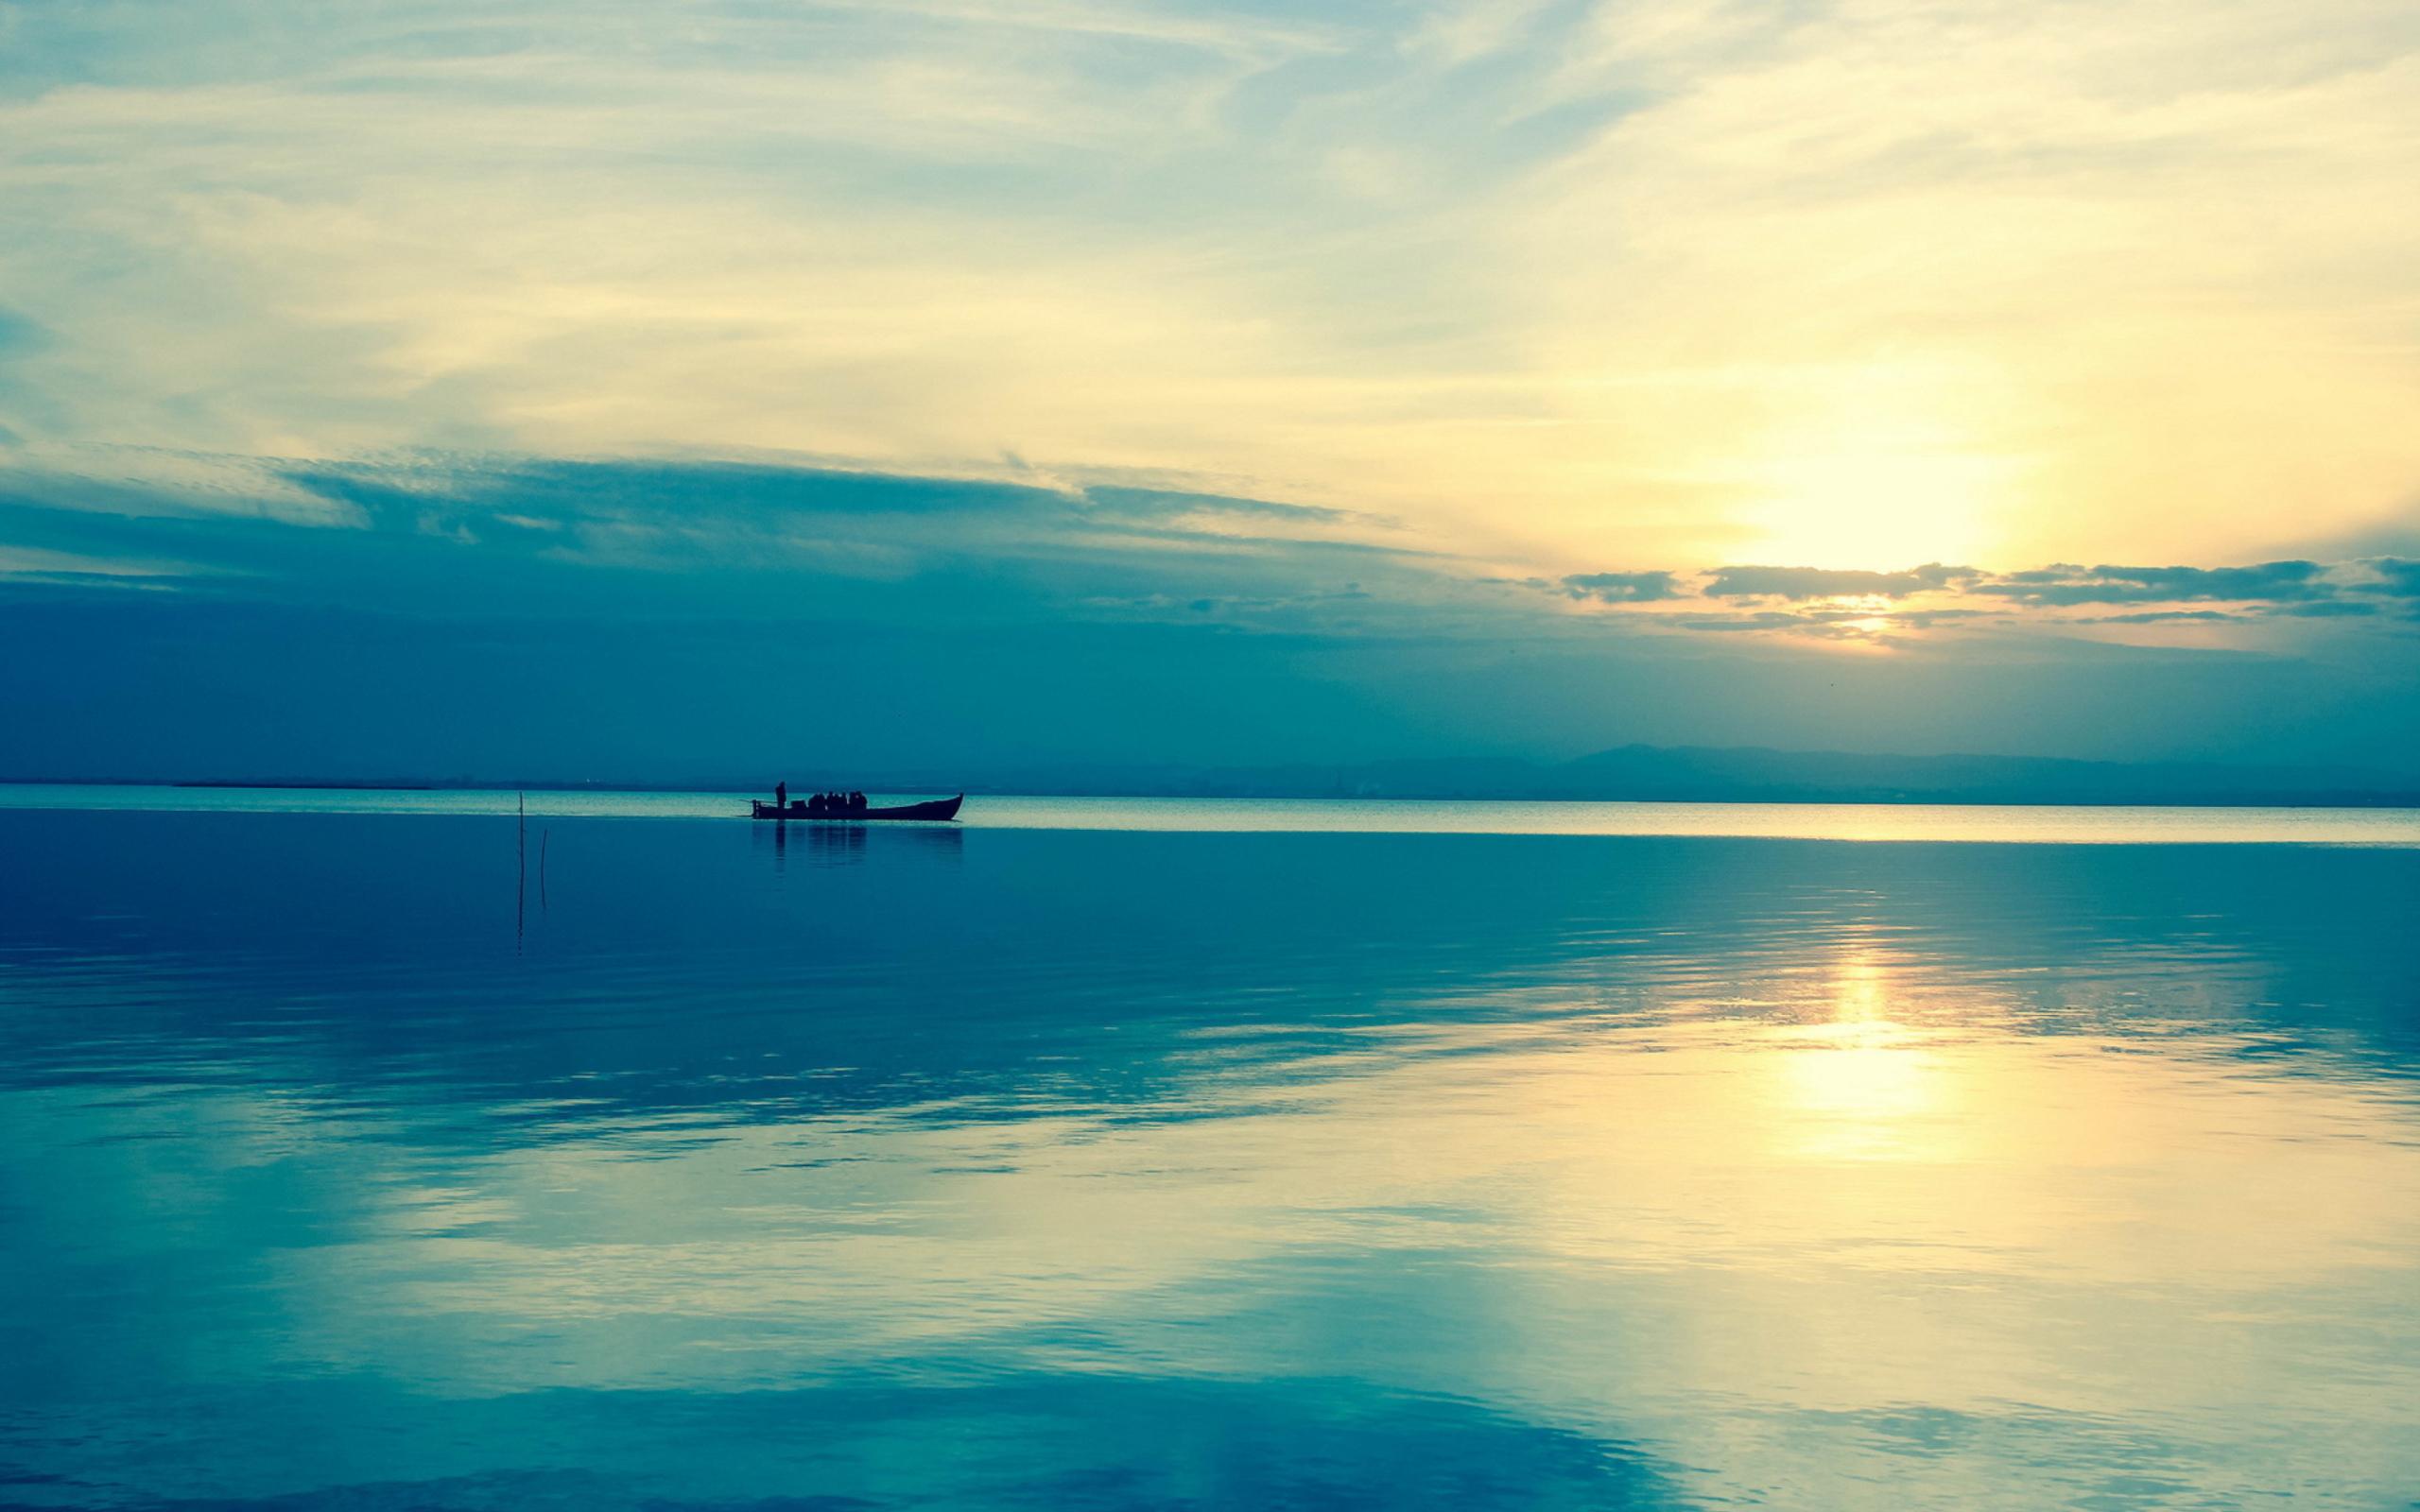 море горизонт берег небо бесплатно